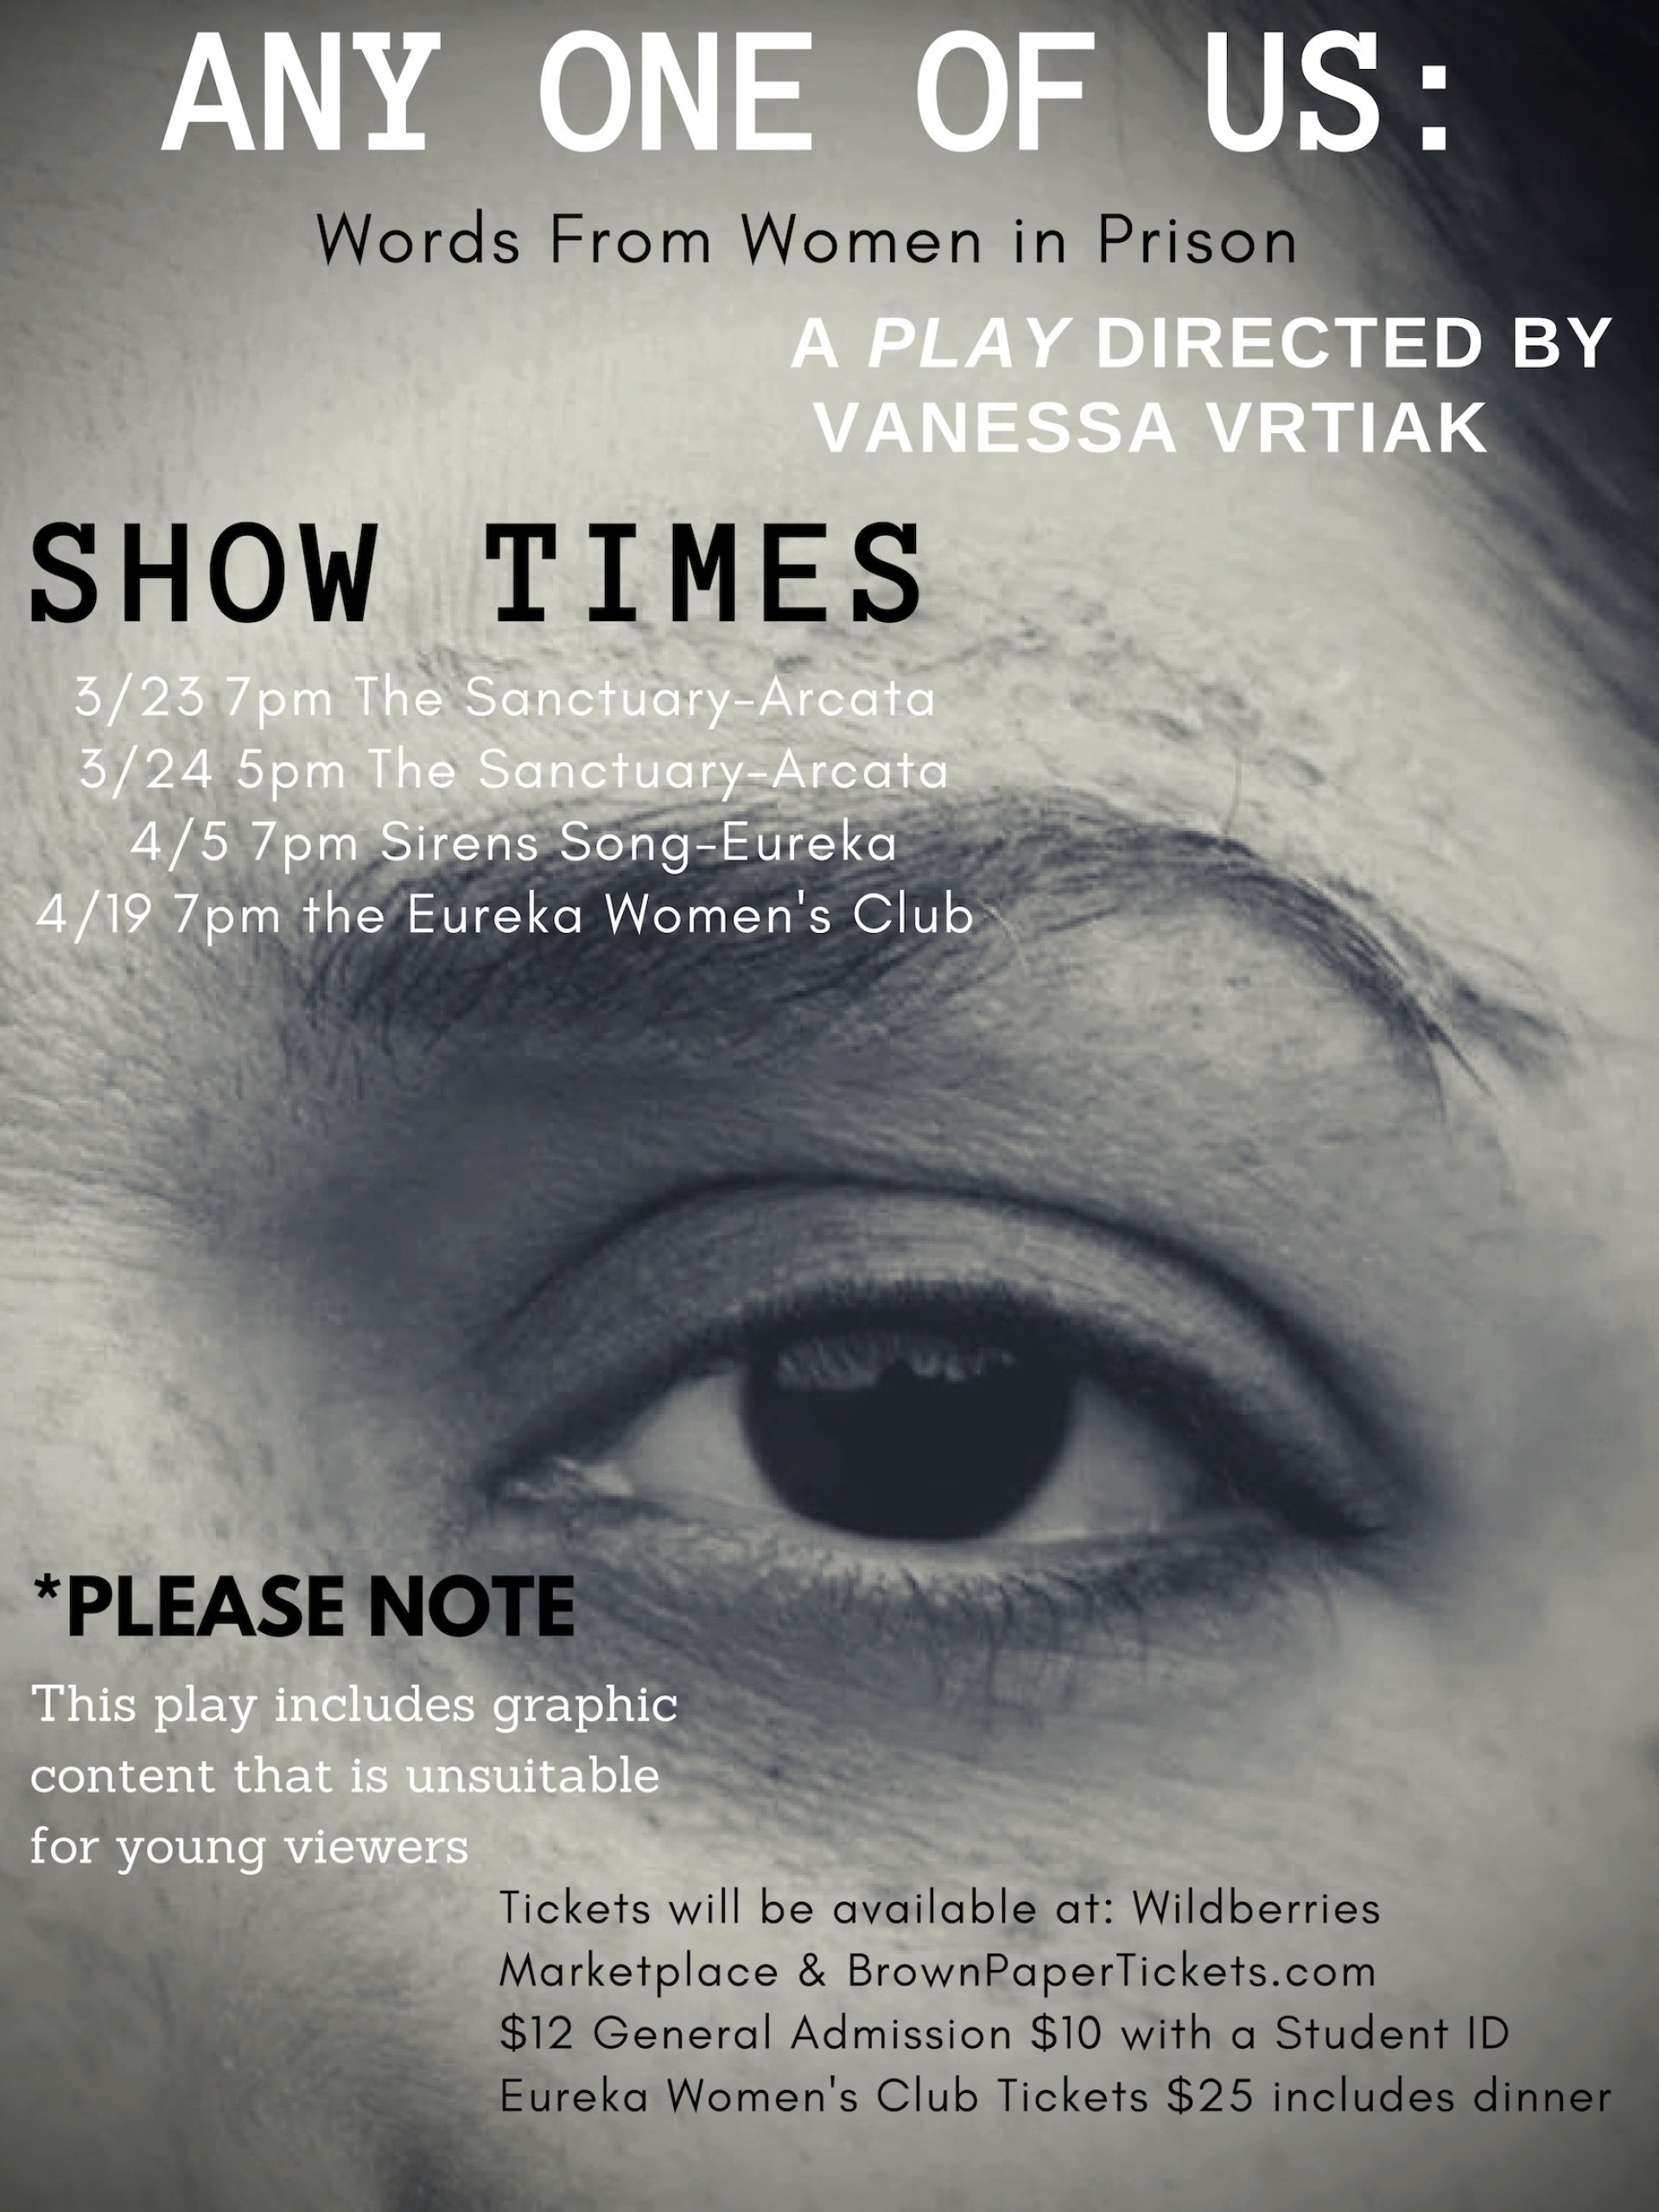 HSU alumni Vanessa Vrtiak directs  the play